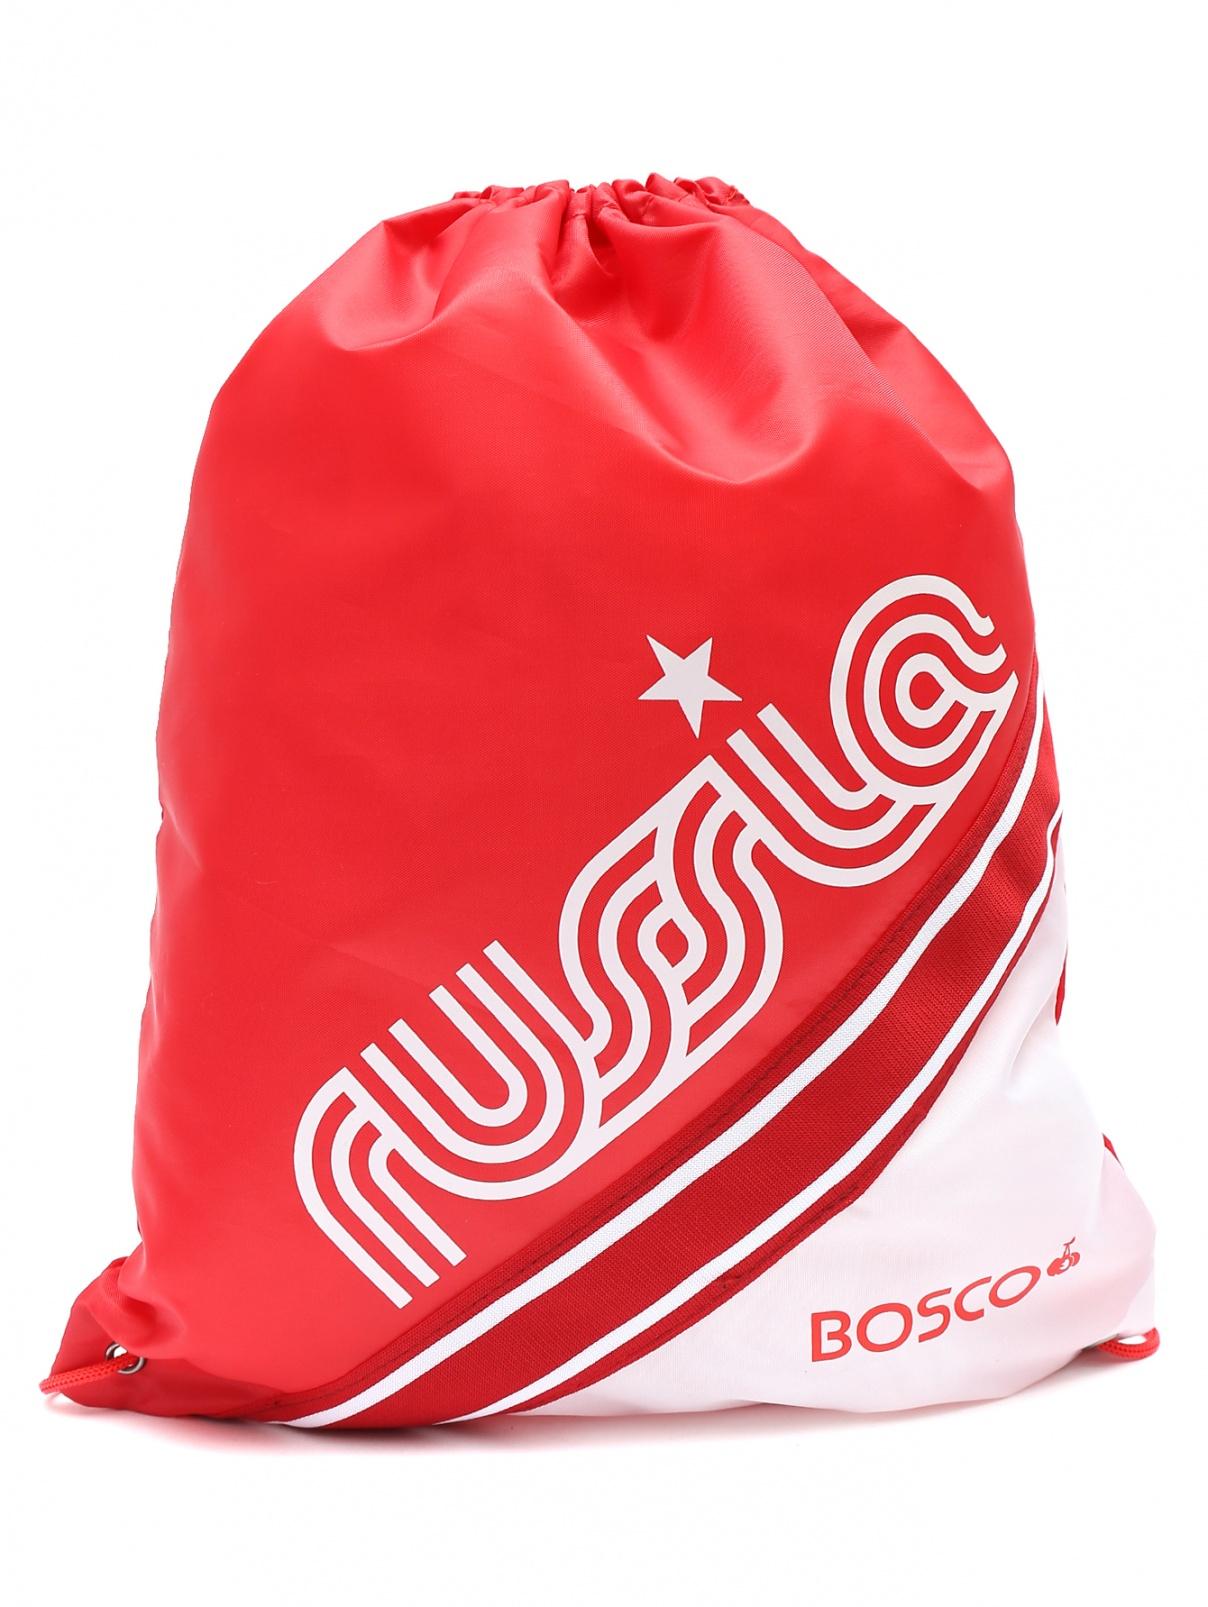 Сумка-мешок для обуви Bosco Sport  –  Общий вид